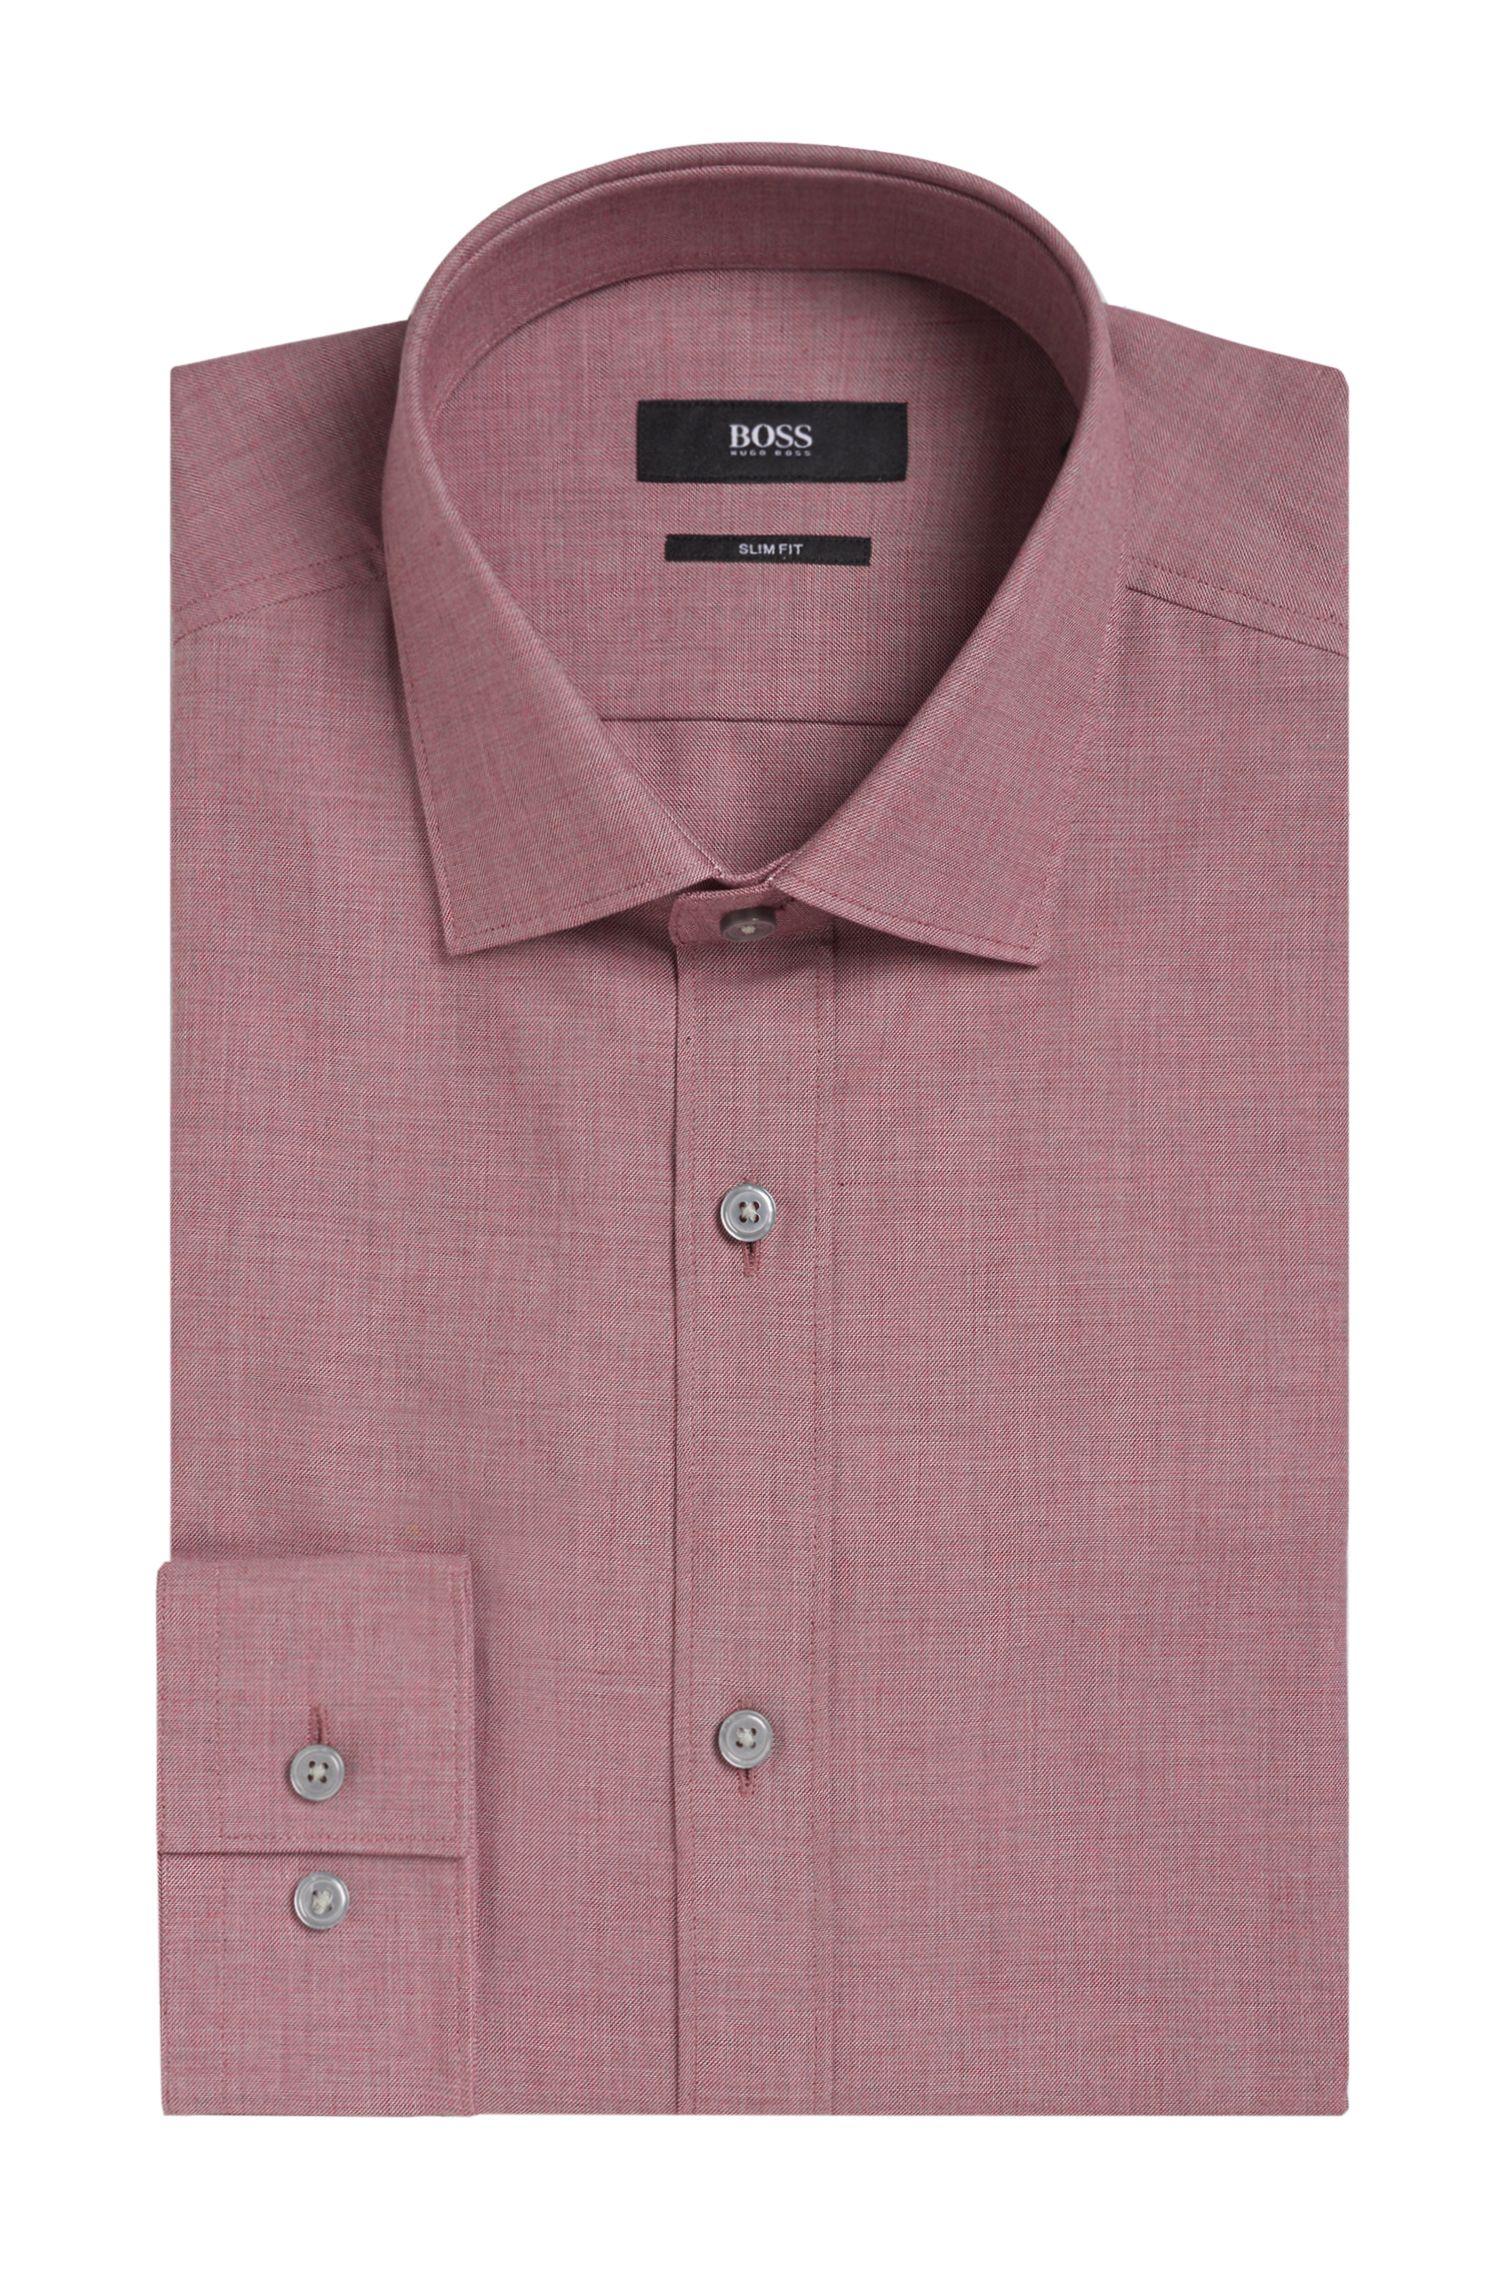 Yarn-Dyed Cotton Dress Shirt, Slim Fit   Isaak